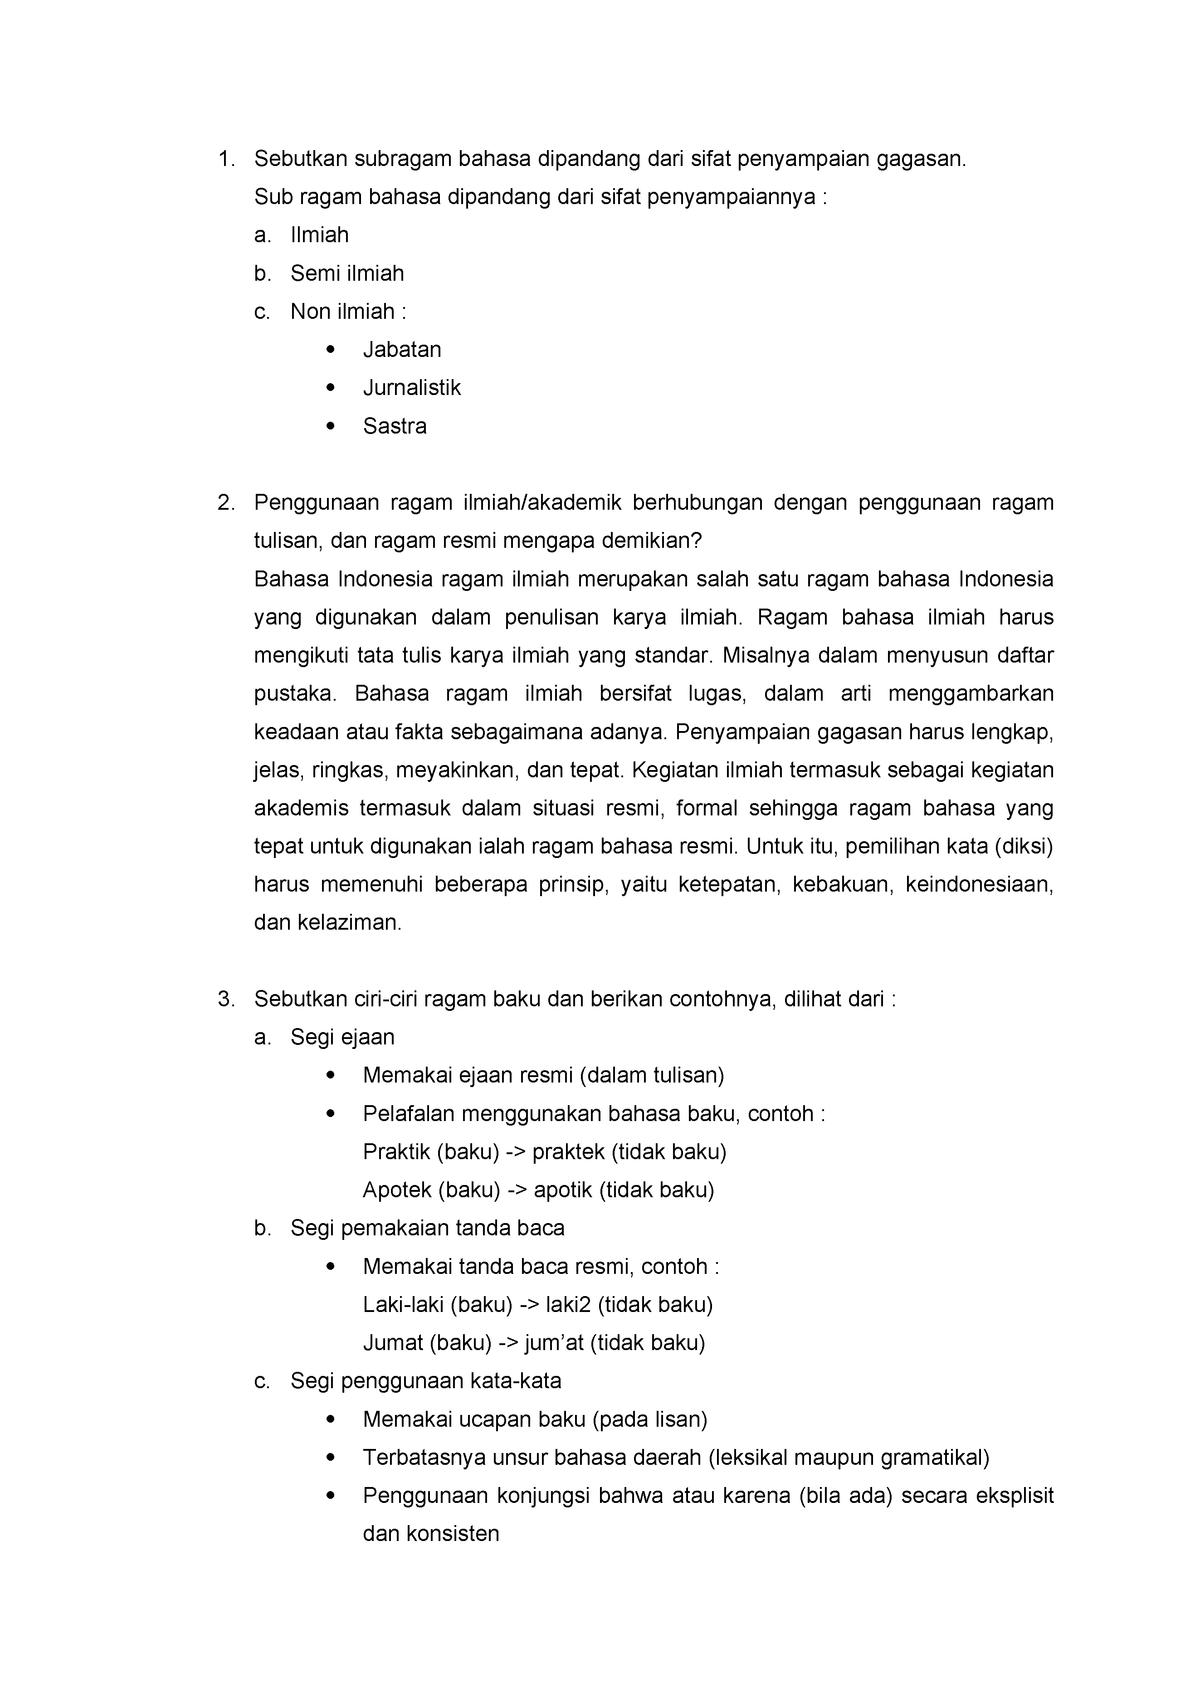 Soal tentang Ragam Ilmiah - UNDIP - StuDocu